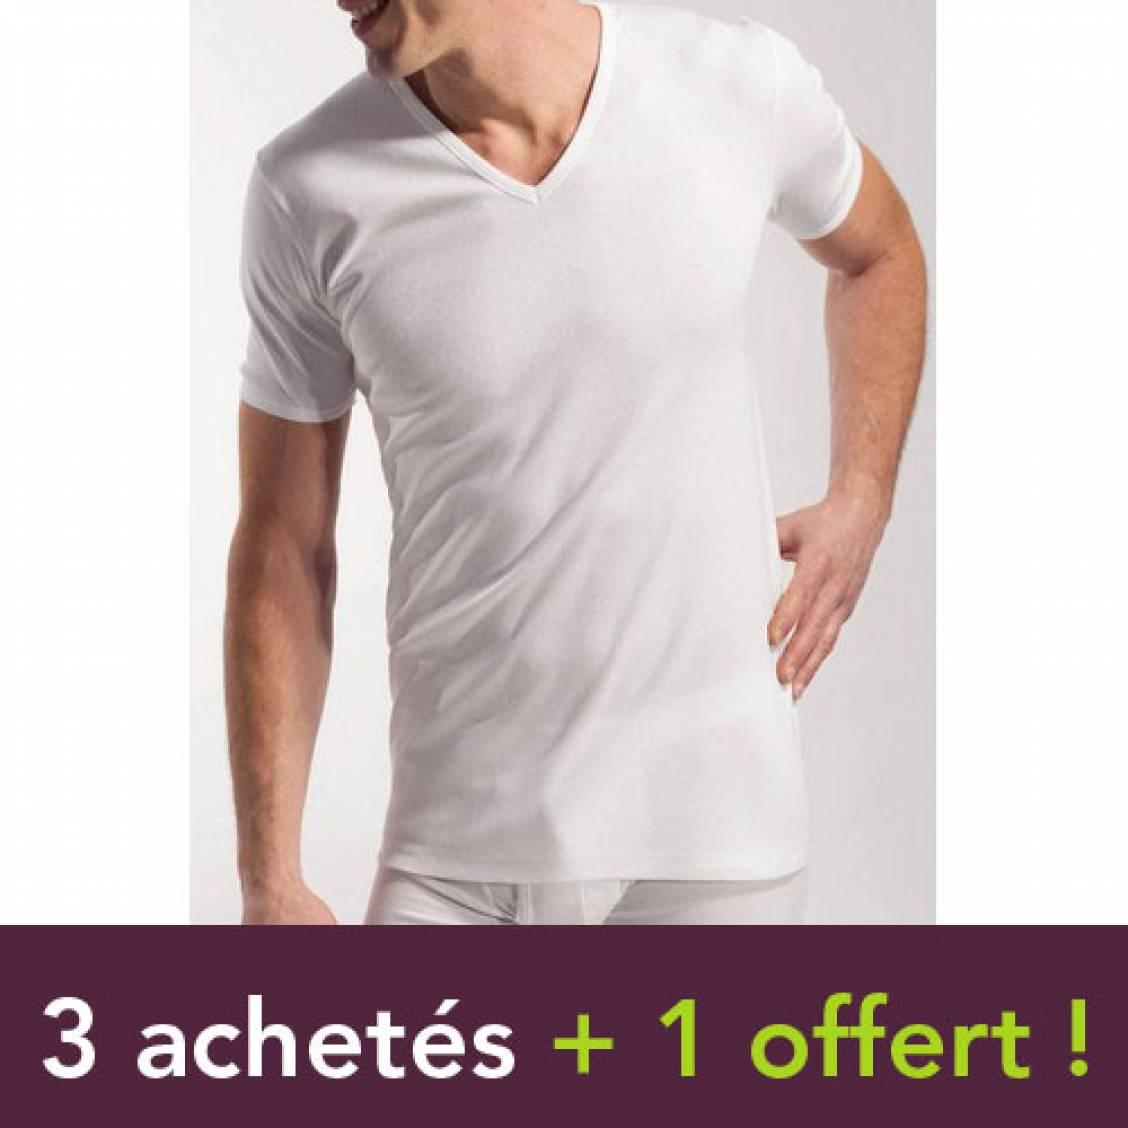 Lot de 4 tee-shirts blancs Eminence